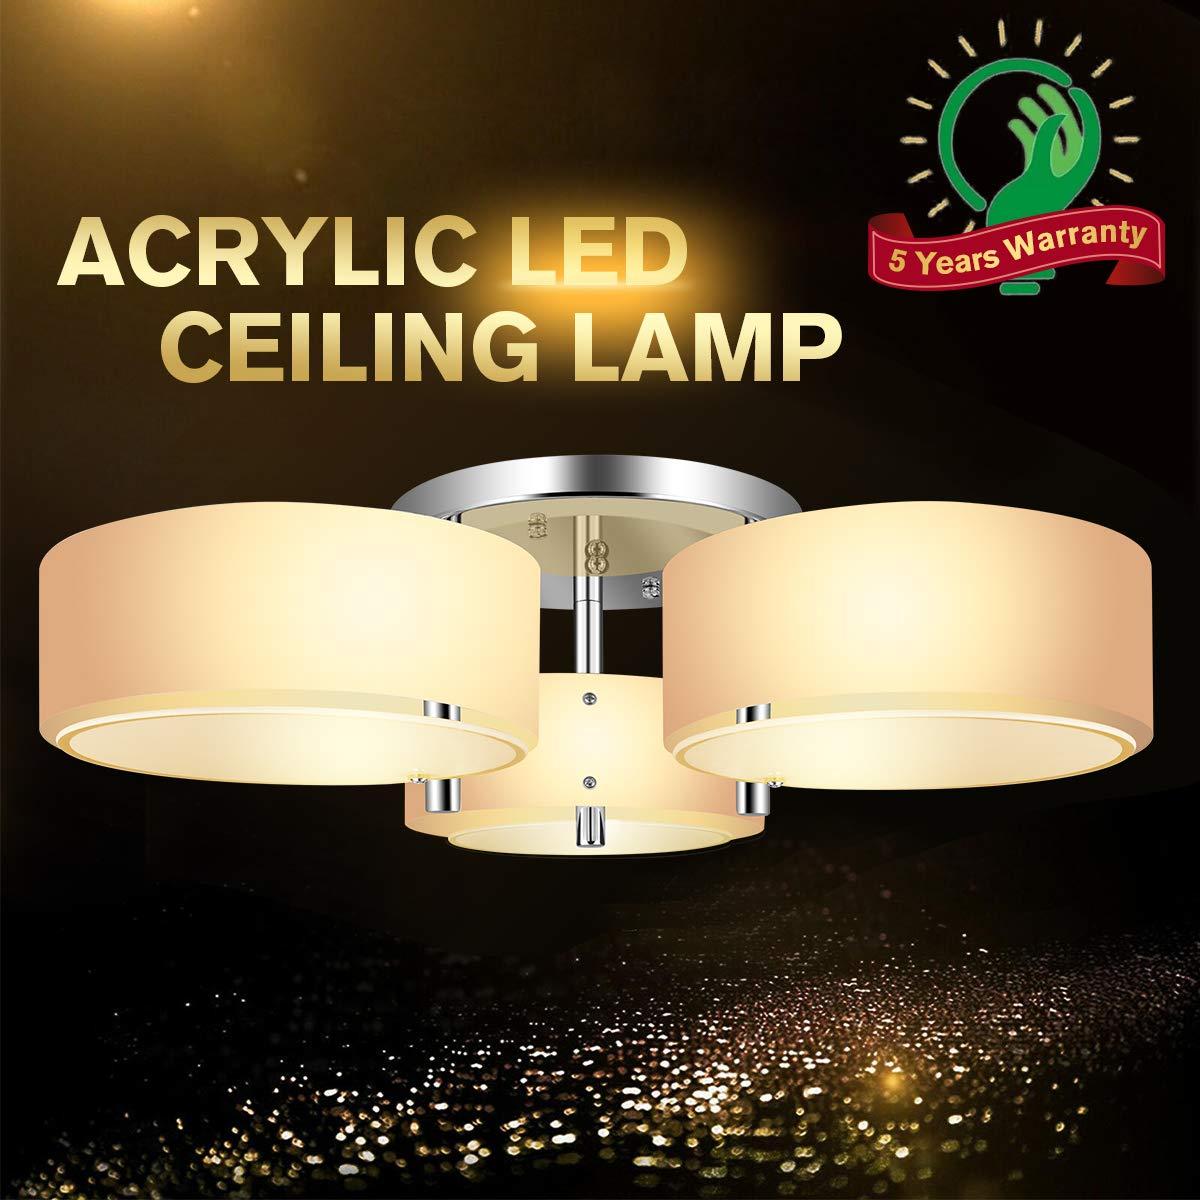 Ceiling lightschandelier ceiling light fixturesmodern flush mount light fixture with 3 bulbsacrylic close to ceiling light fixtures pendant lighting